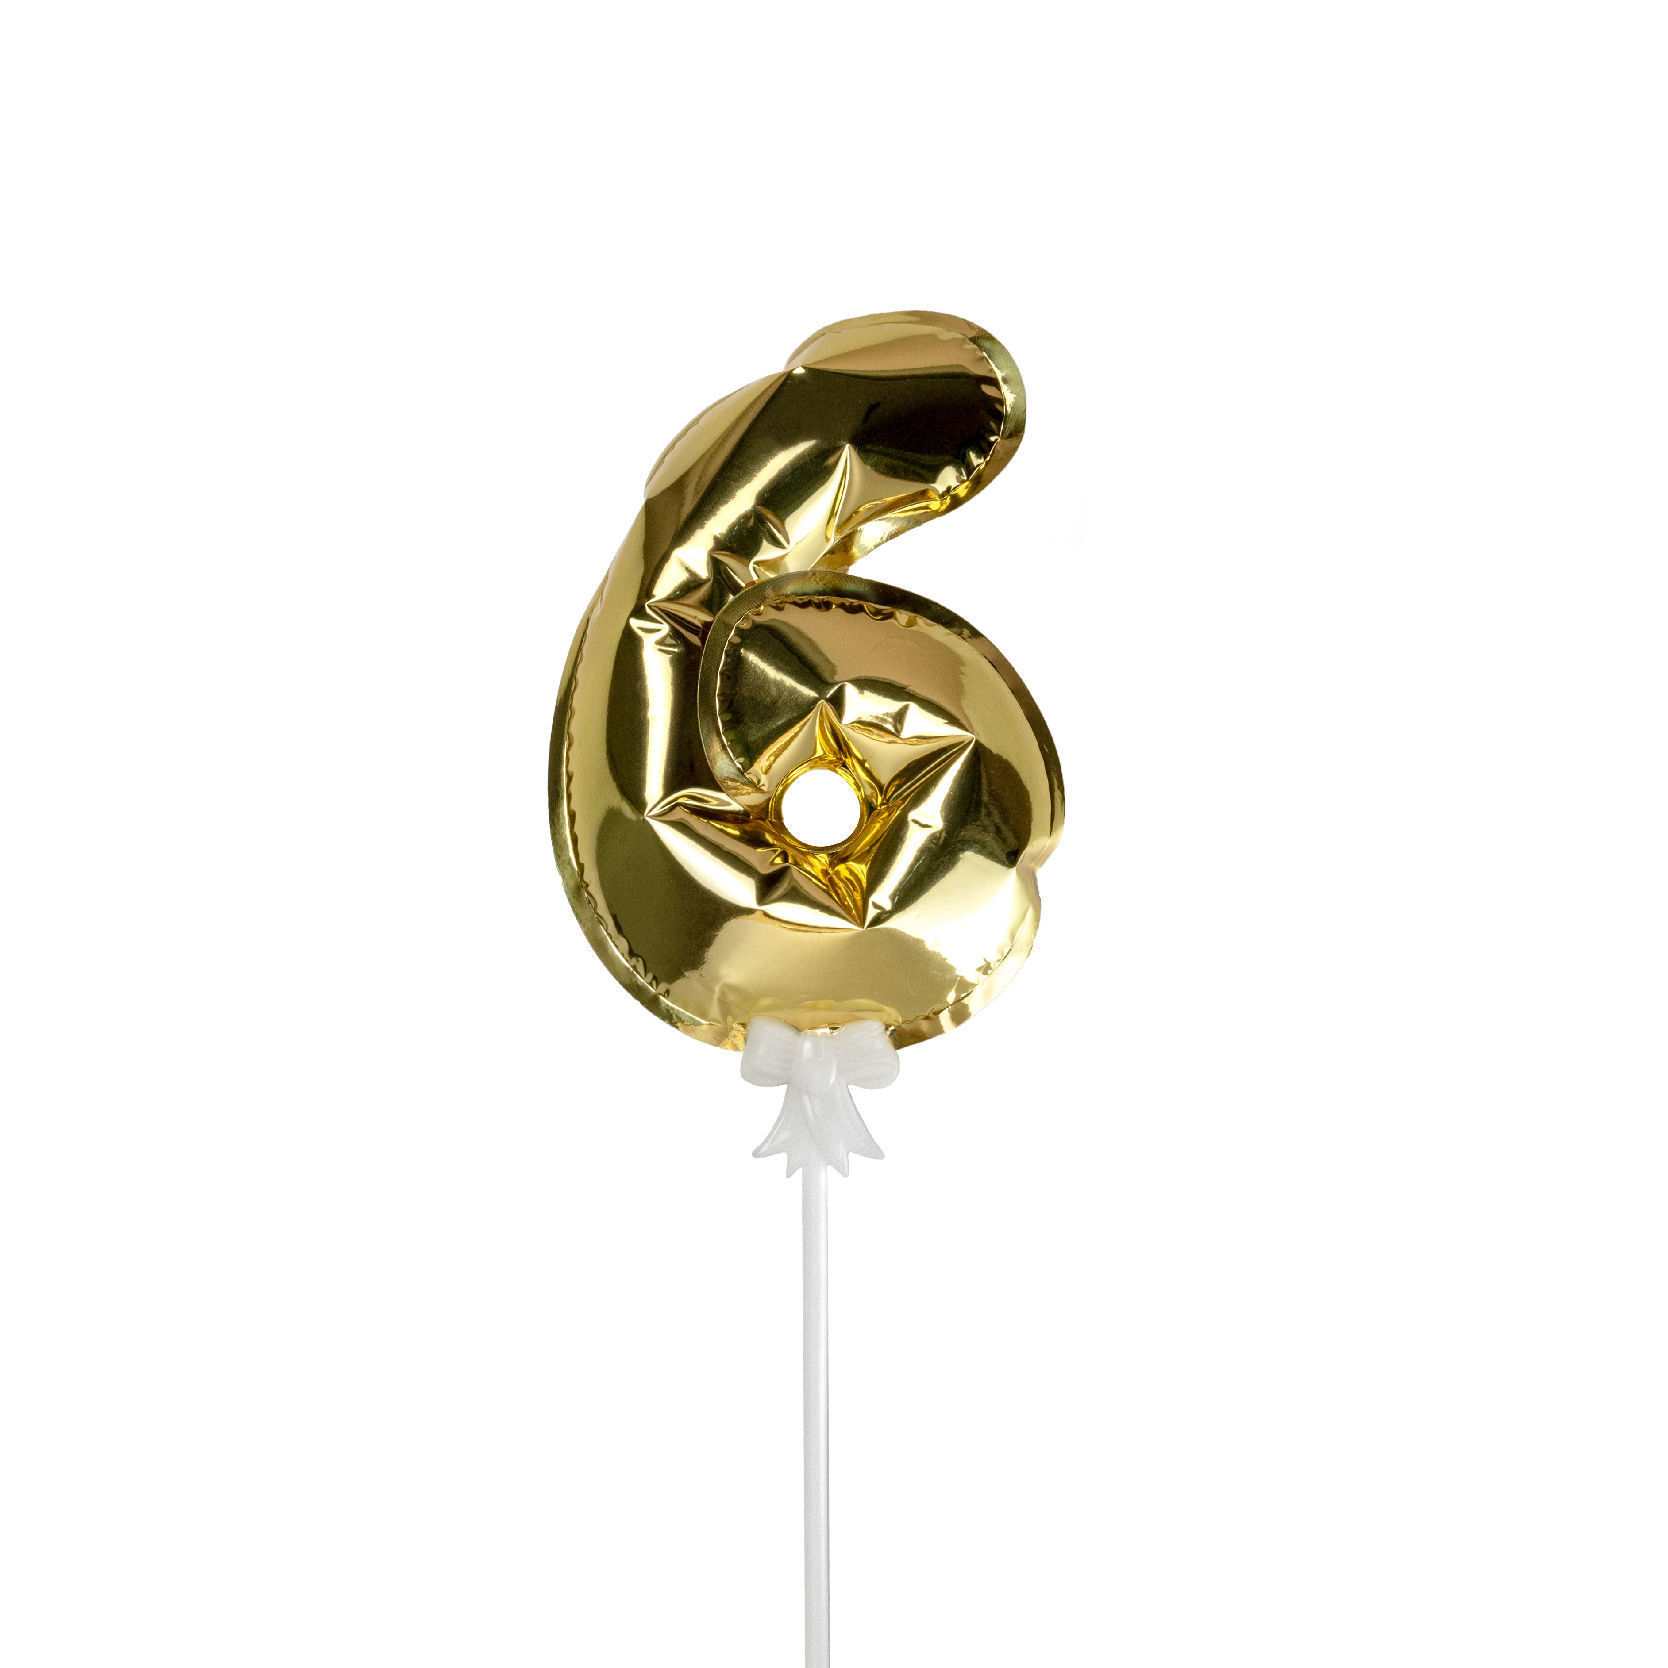 Picture of 金色數字氣球插件 - 6